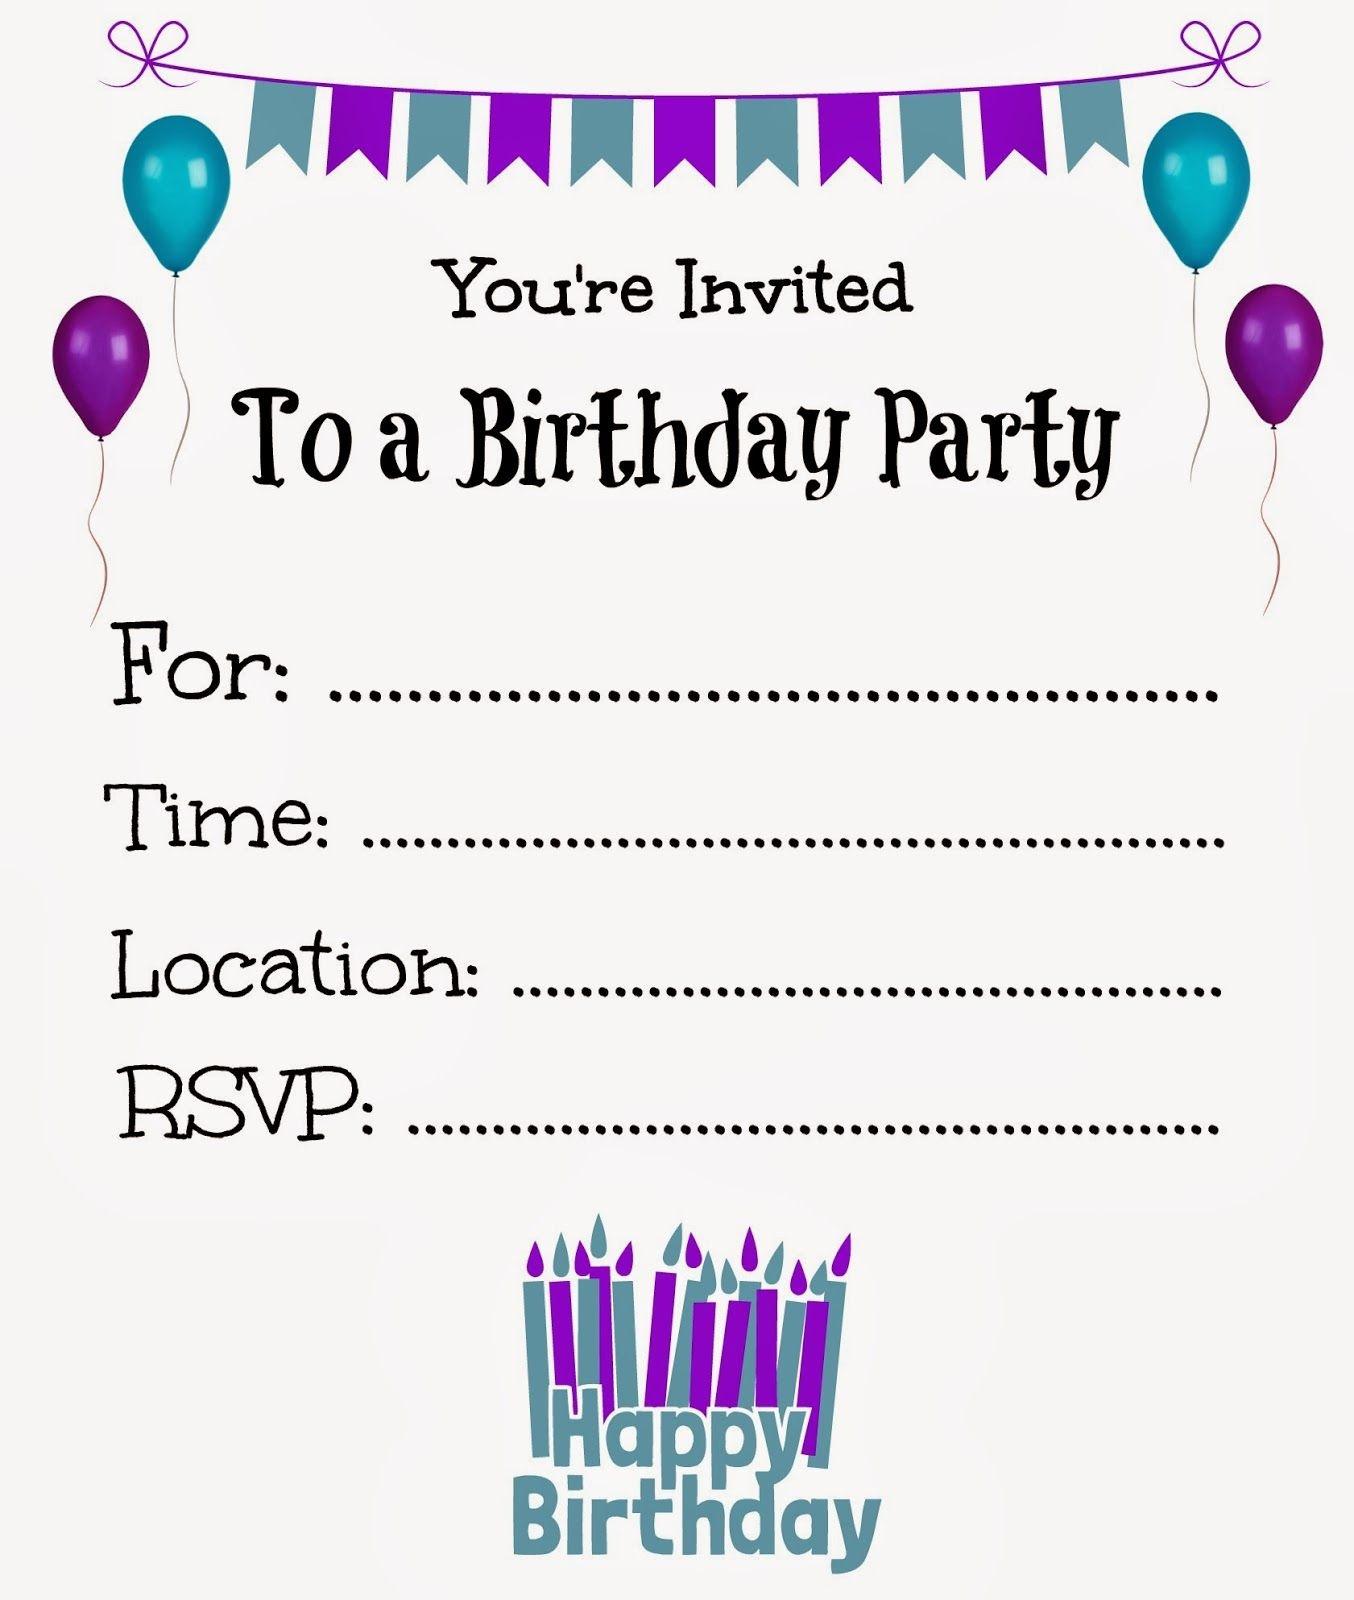 Free Printable Birthday Invitations For Kids #freeprintables - Make Your Own Printable Birthday Cards Online Free